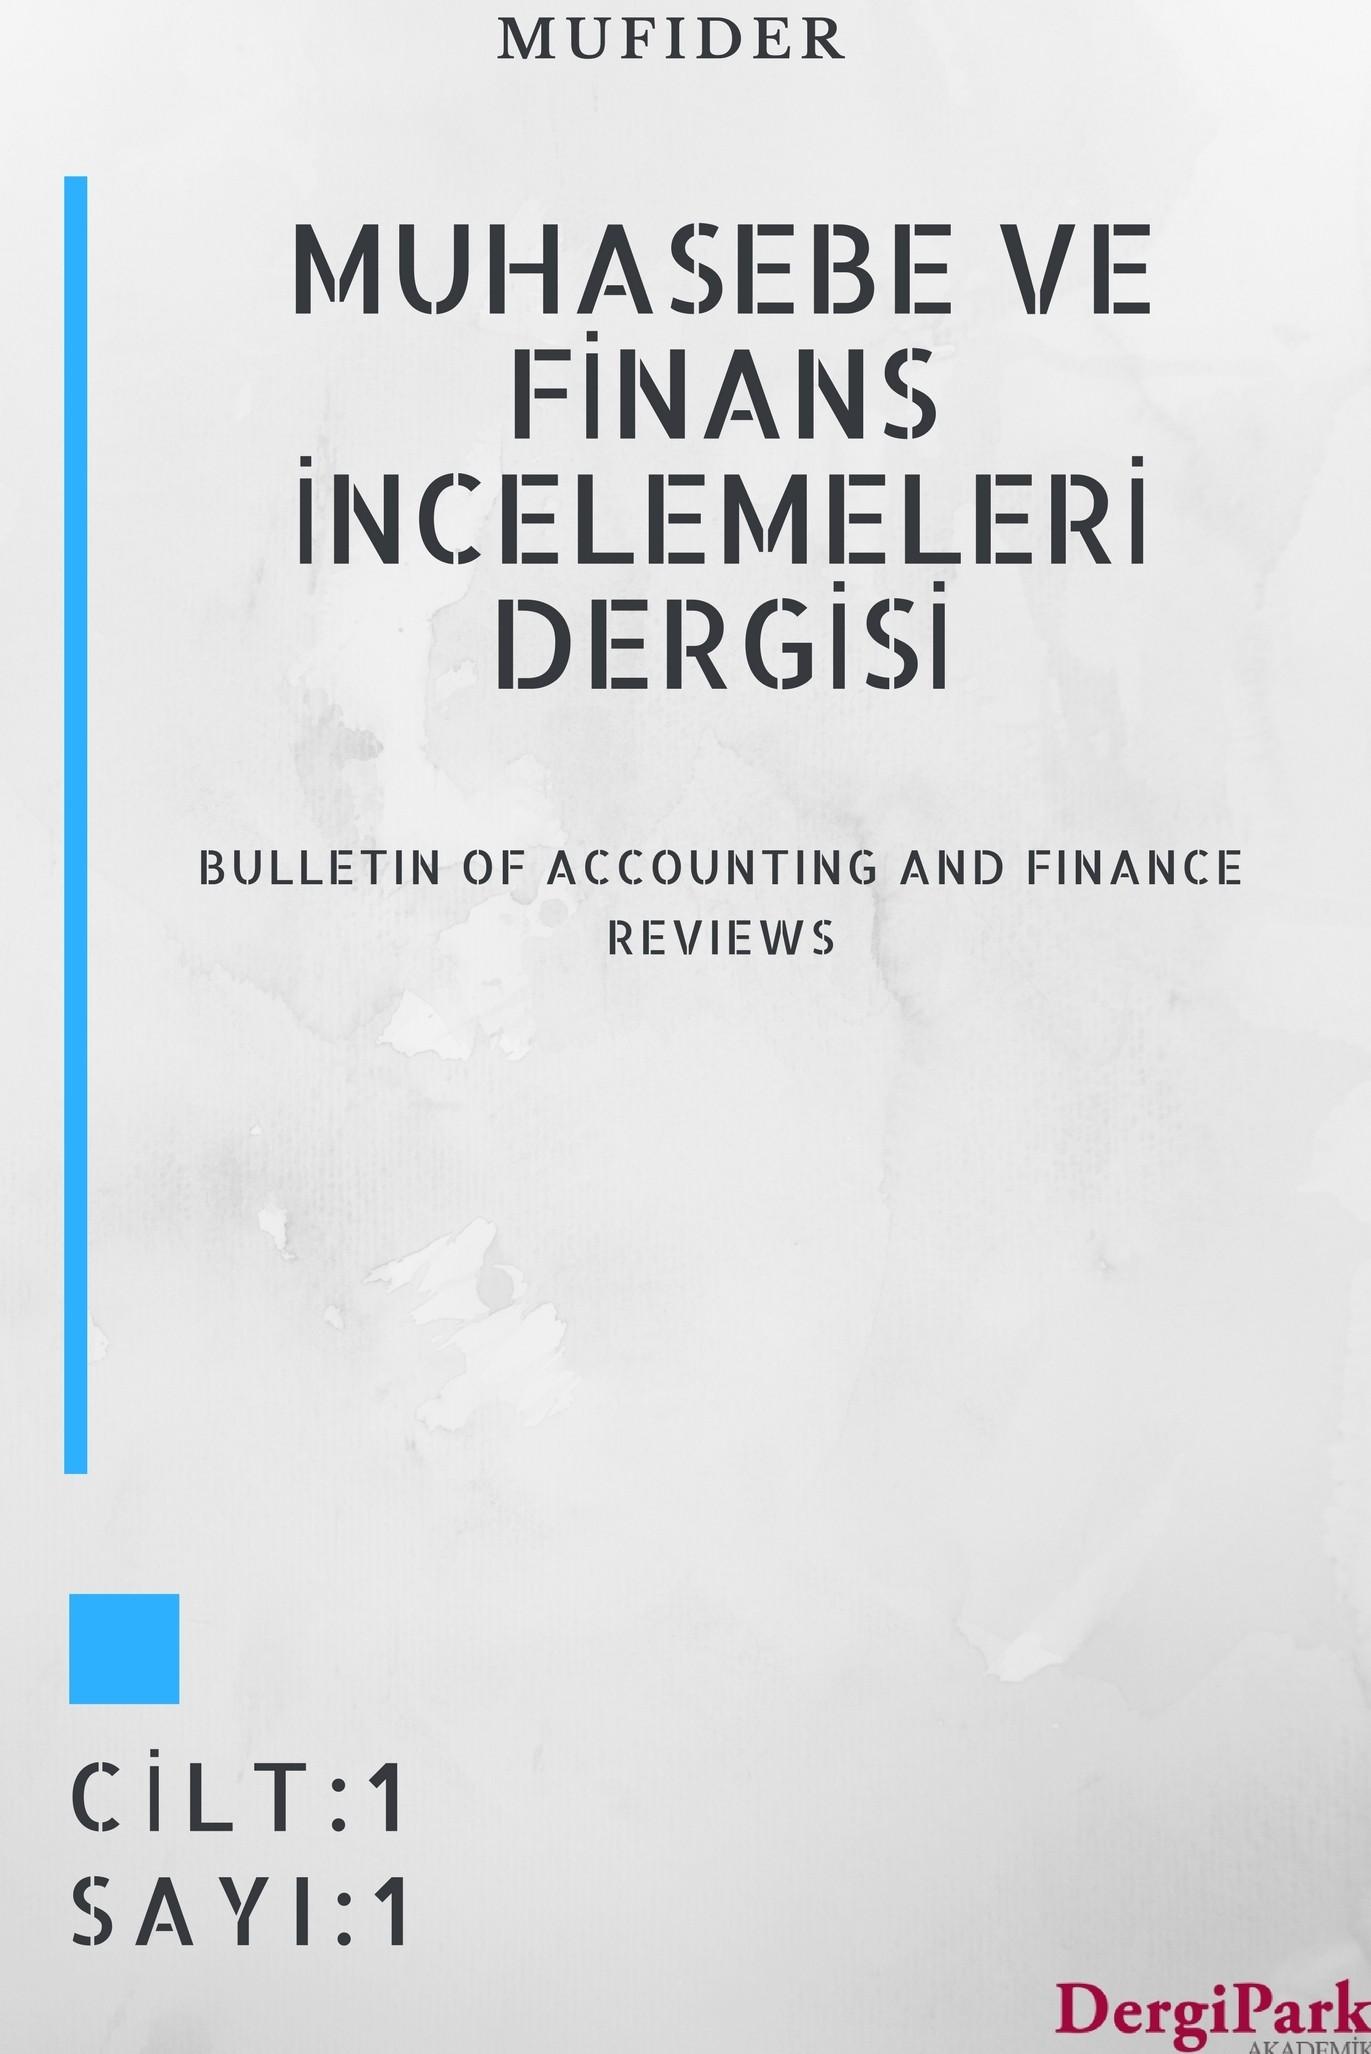 Muhasebe ve Finans İncelemeleri Dergisi